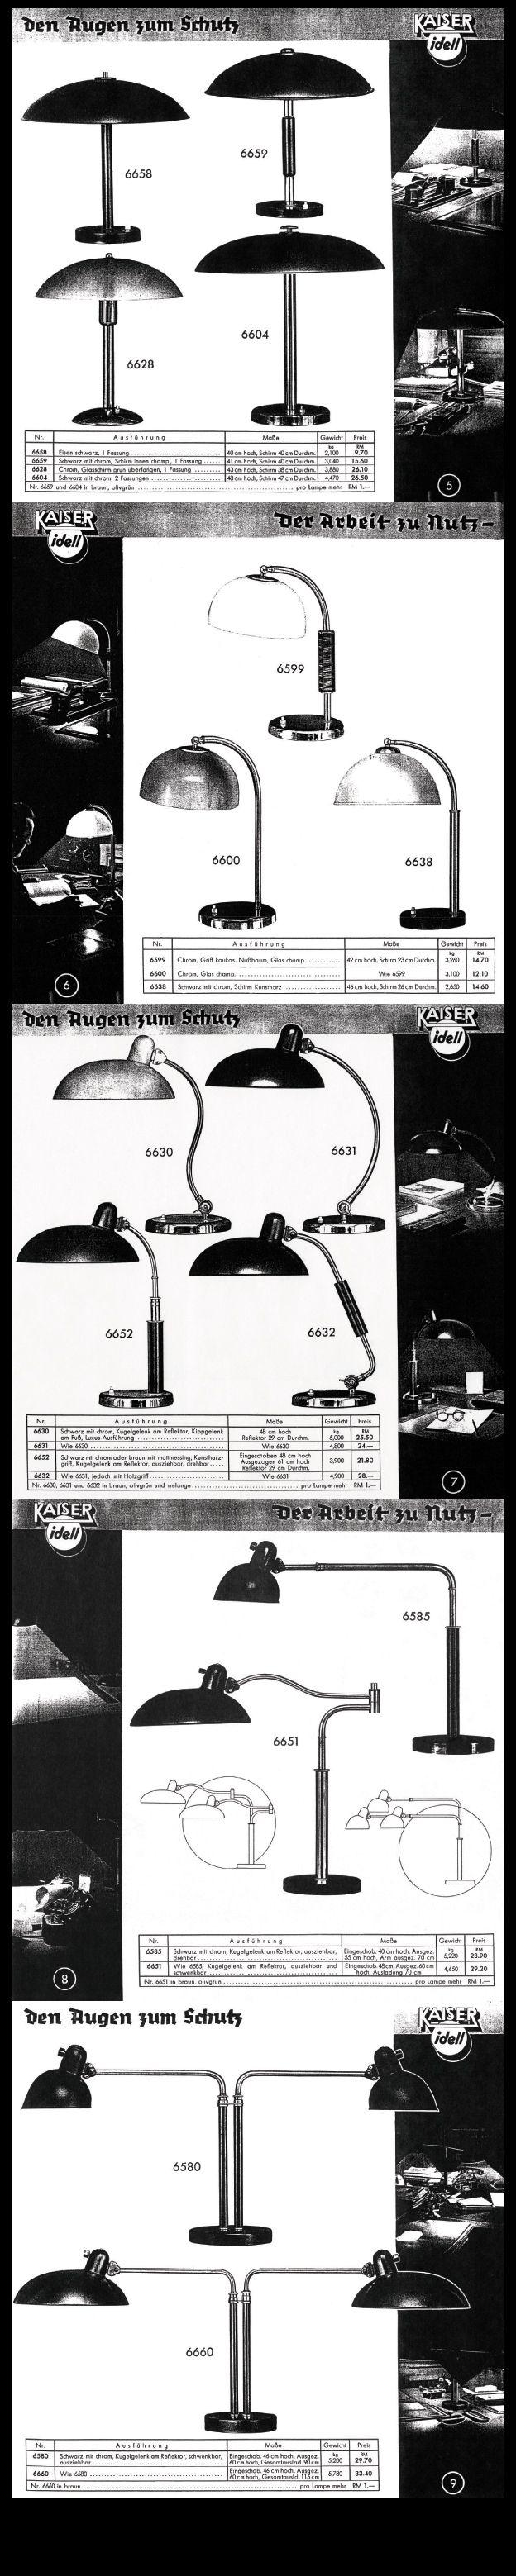 Rare Kaiser & Co. Work Lamp Catalogue 1936 - Pages 5 to 9 #KaiserIdell #Kaiser_Idell #ChristianDell #Bauhaus #Modernism #Modernist #Molecula